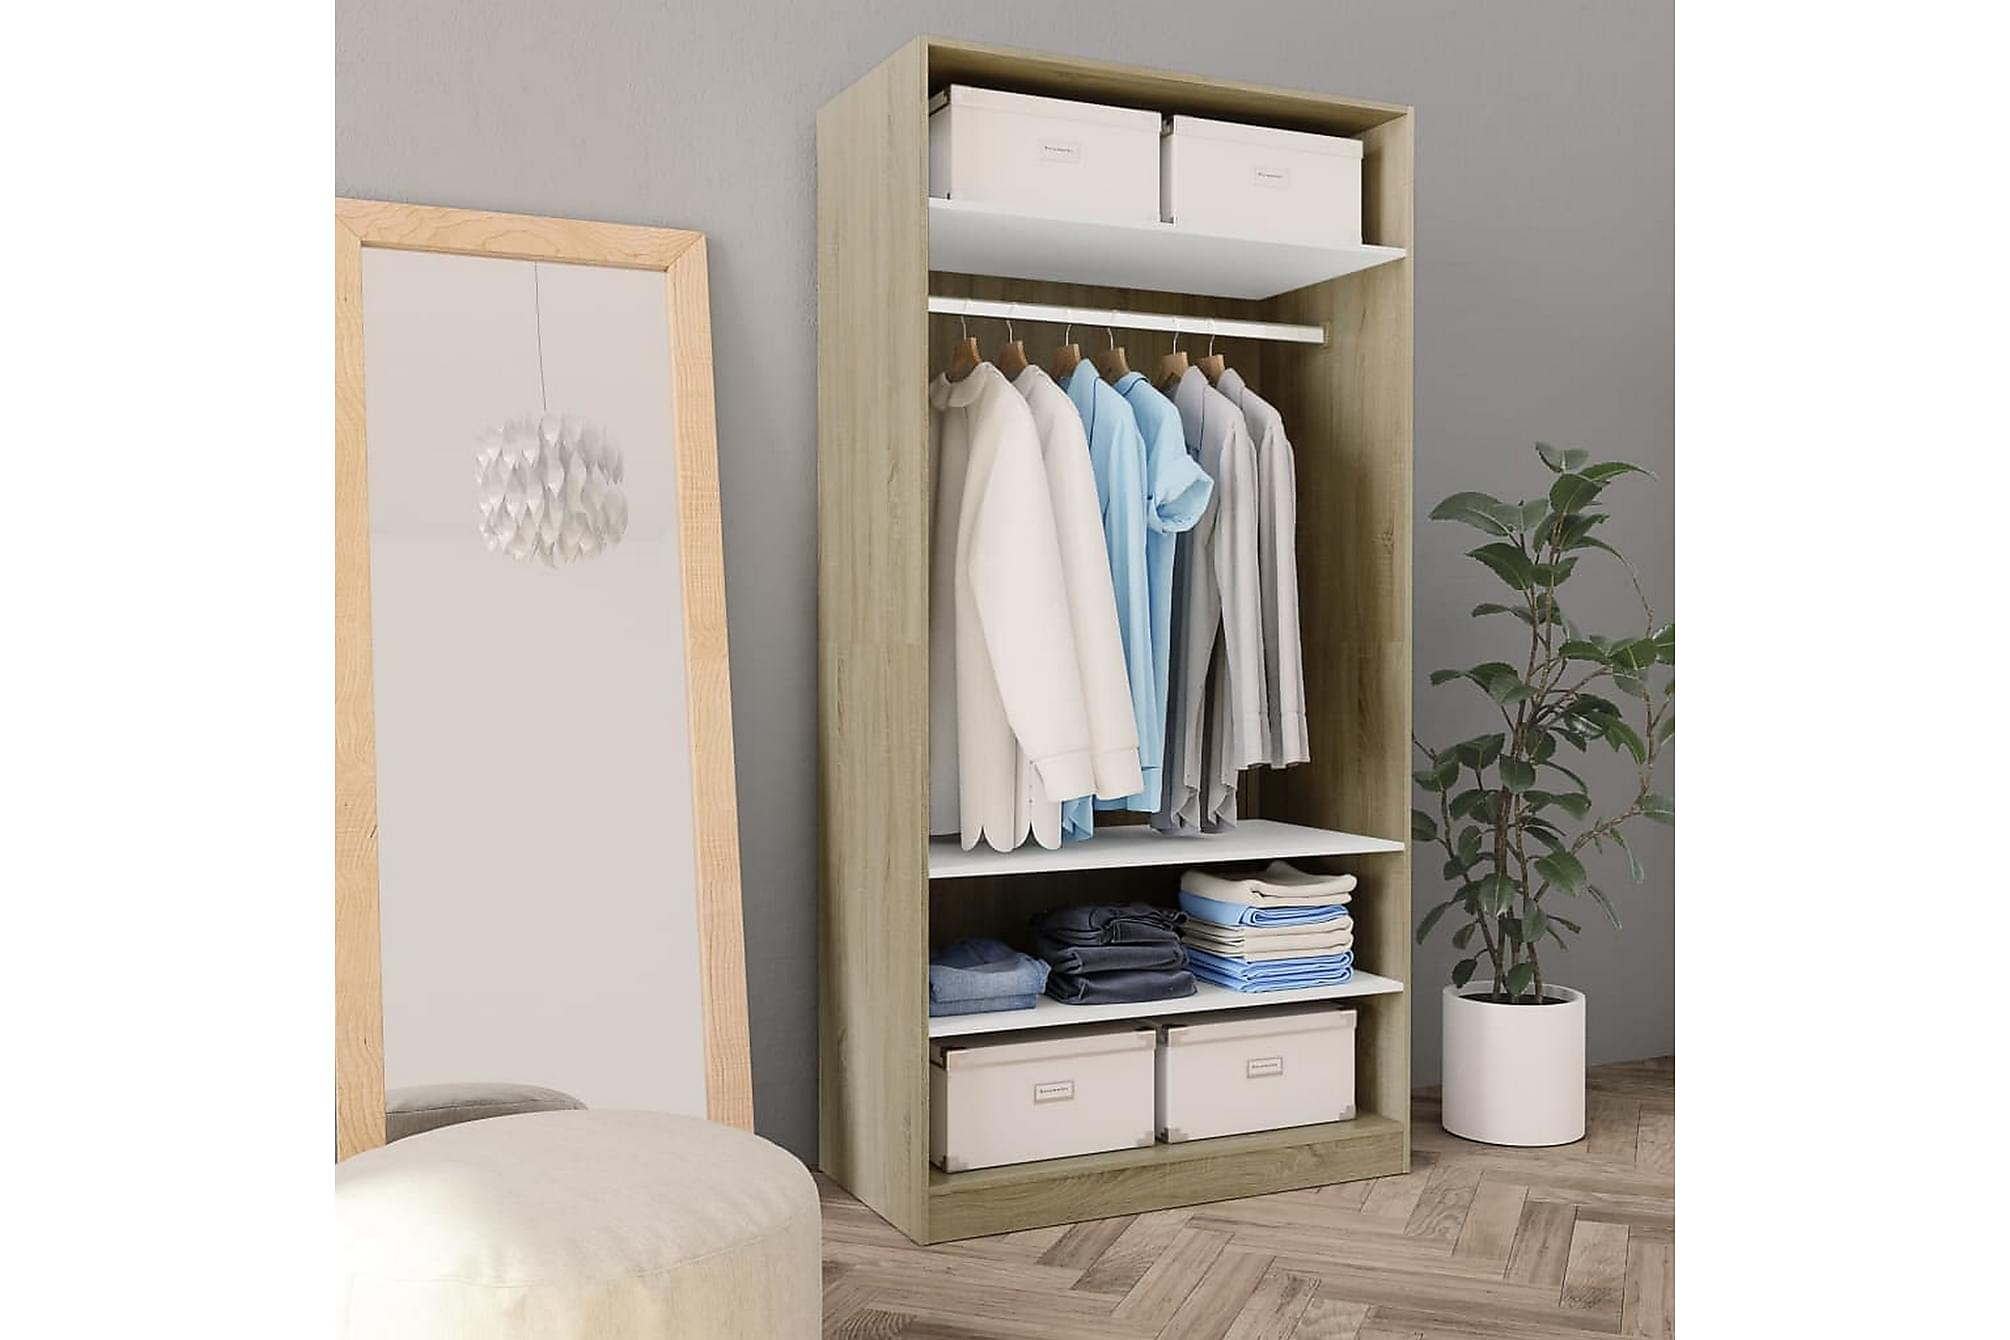 Garderob vit och sonoma-ek 100x50x200 cm spånskiva